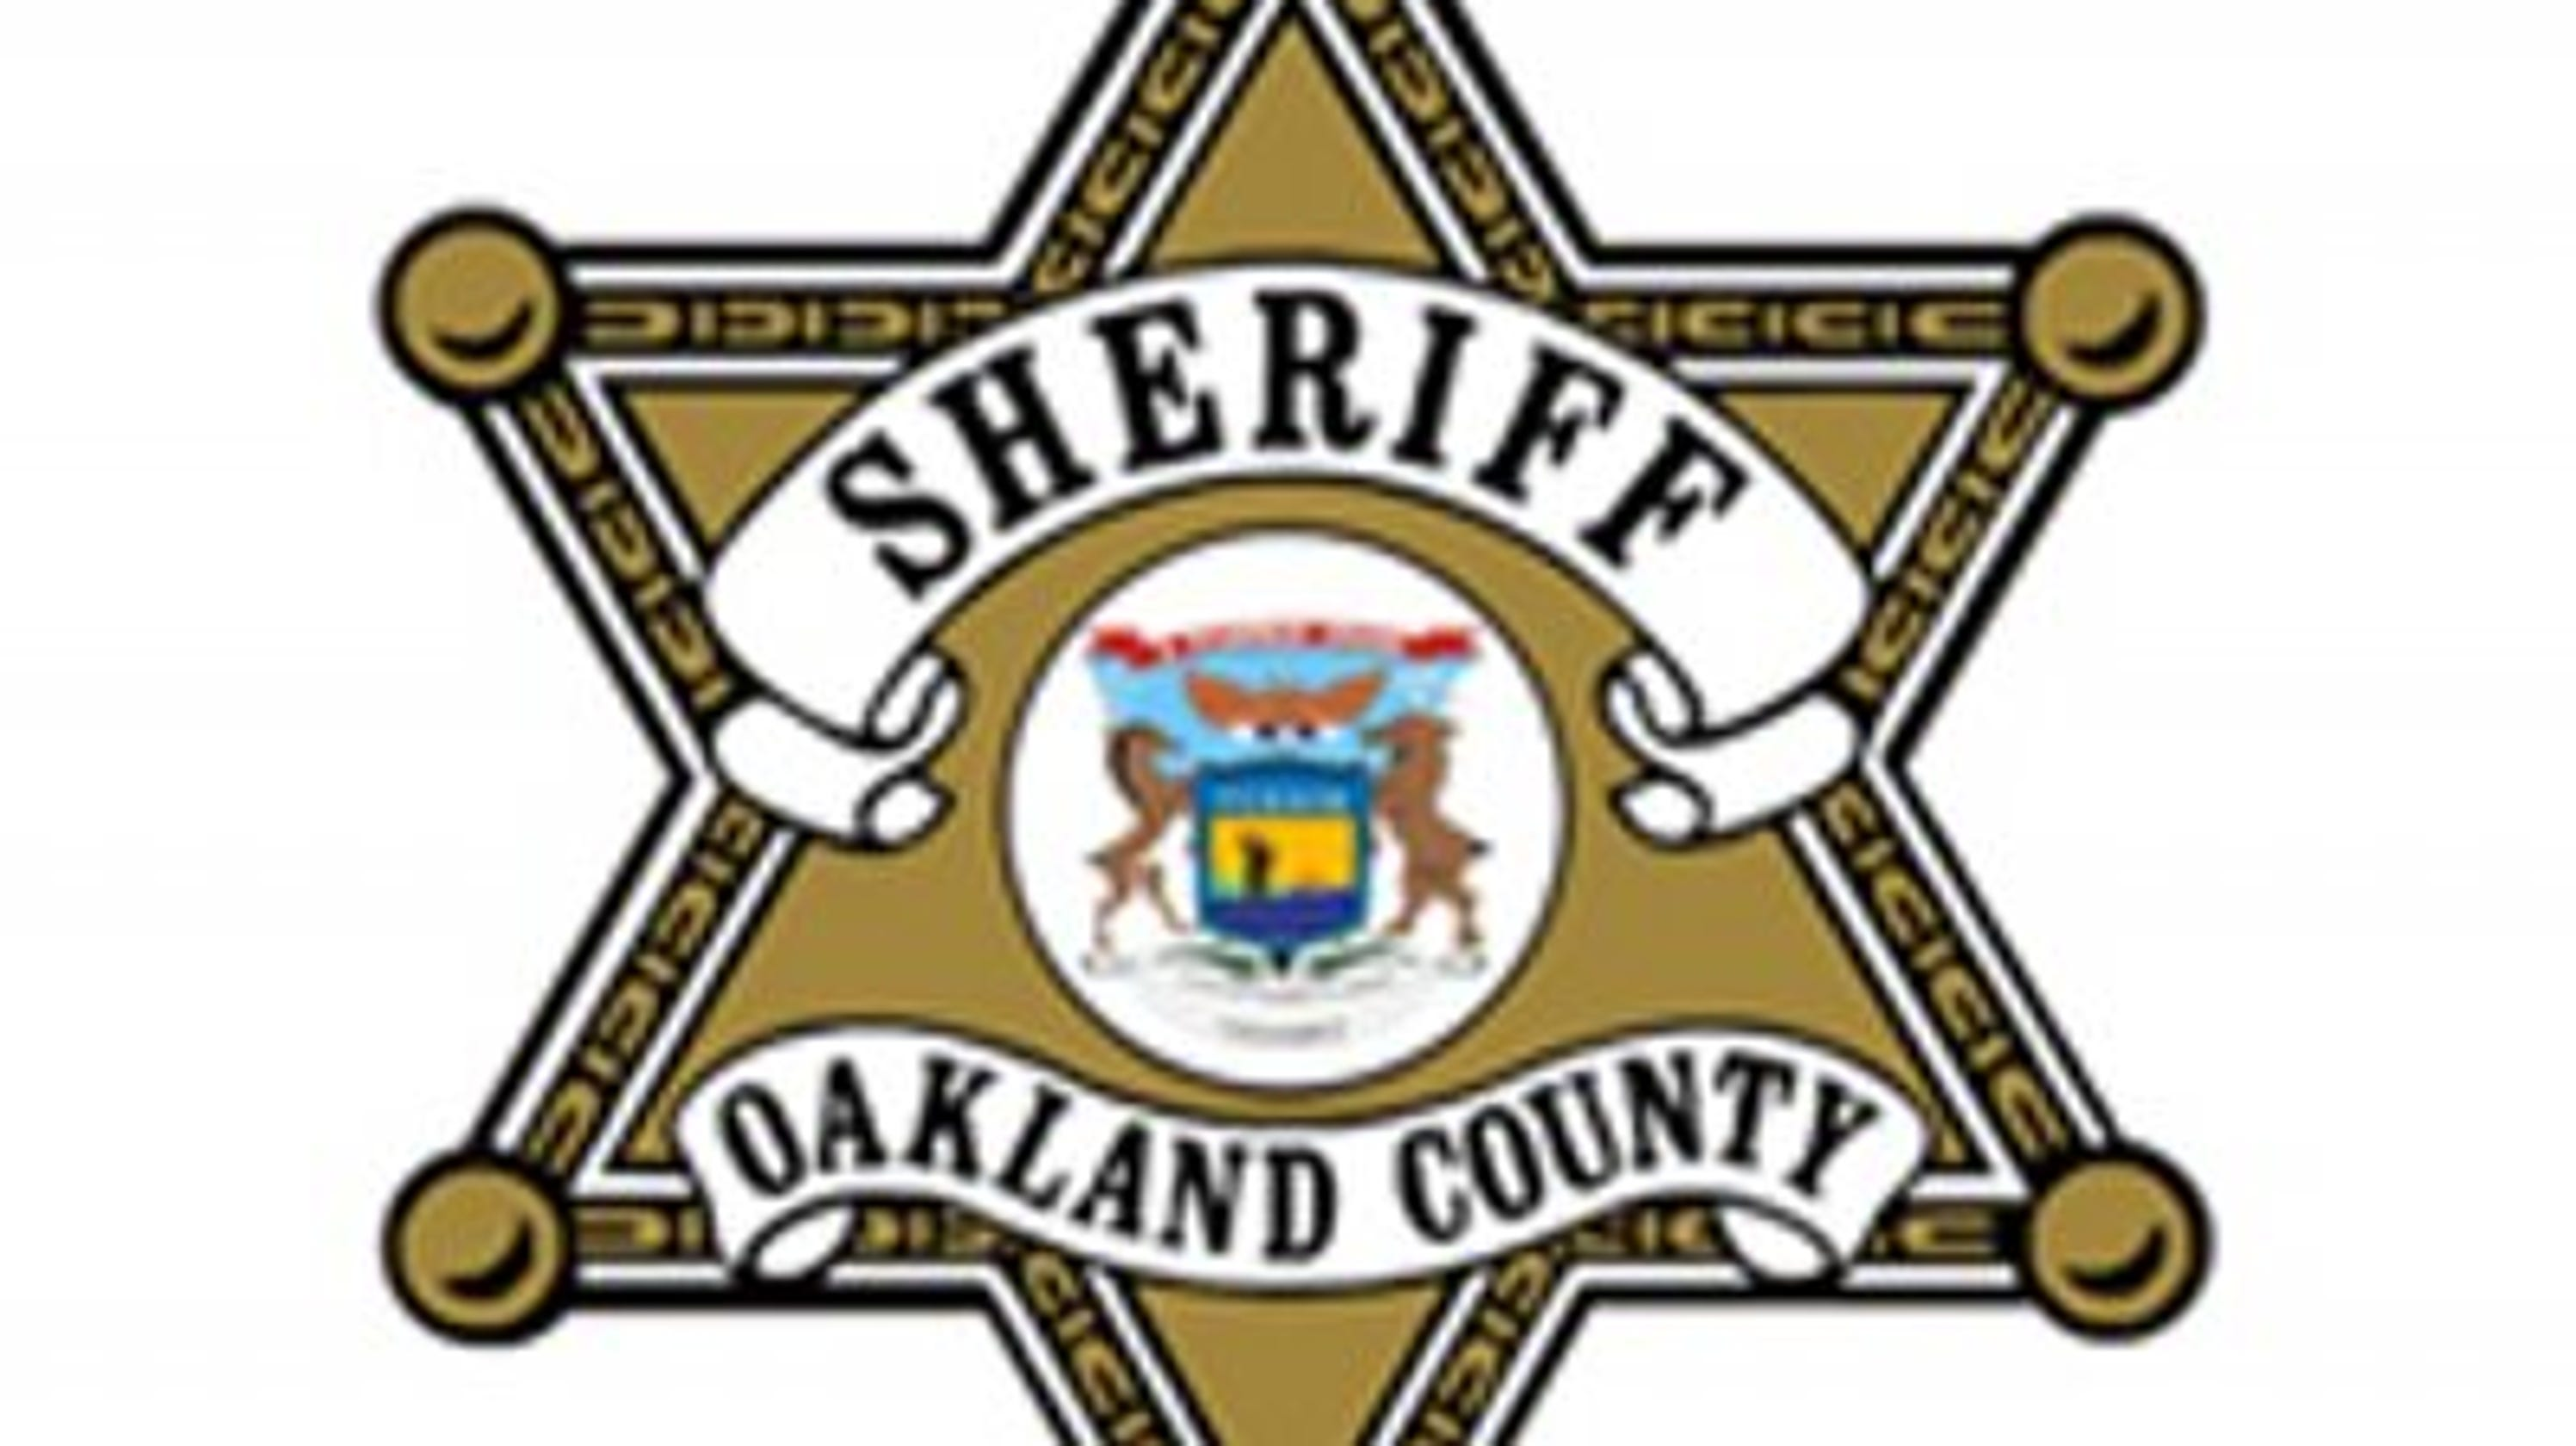 Pontiac man, 74, arrested after threatening deputy with